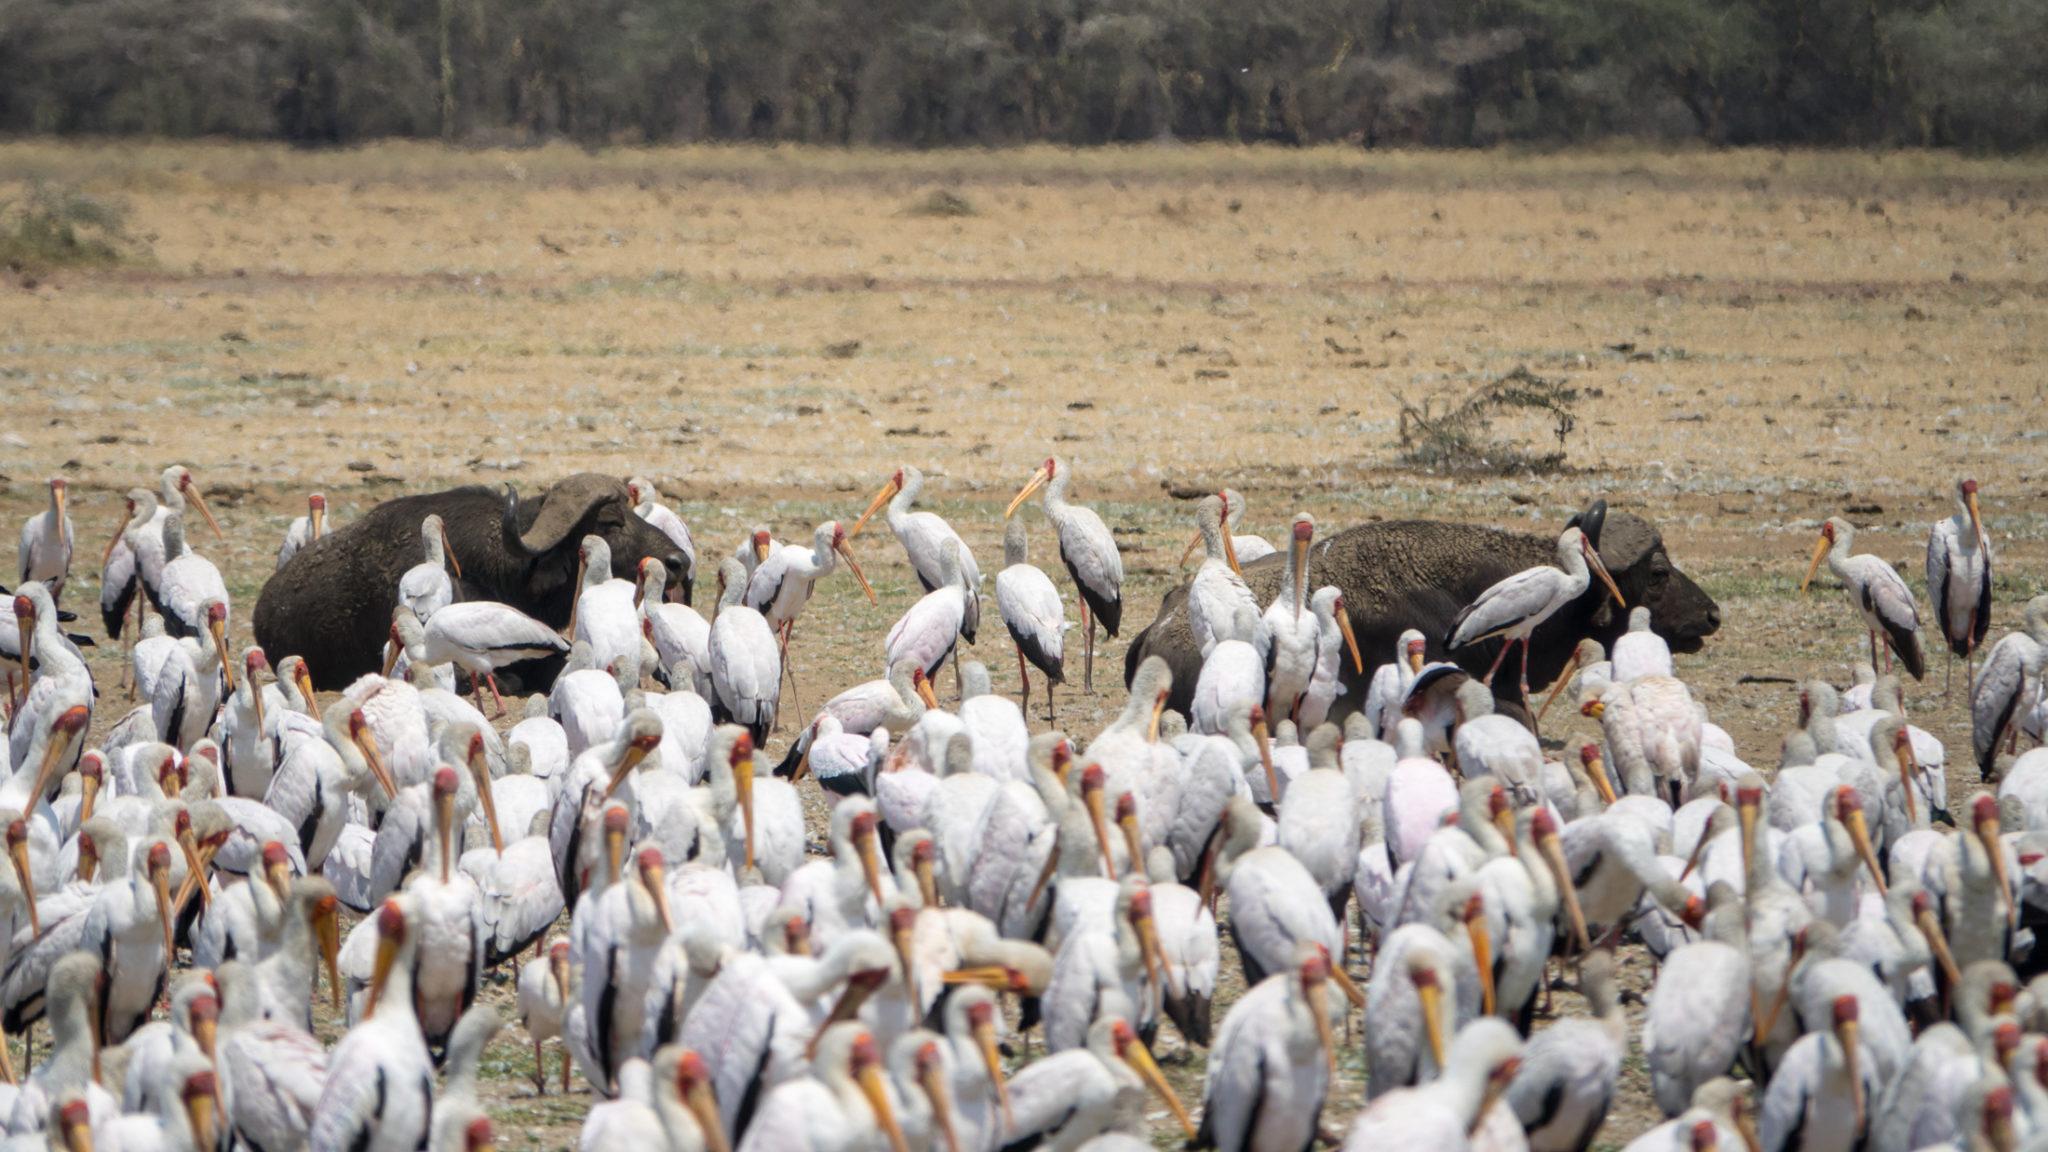 Büffel und Vögel am Lake Manyara, Tansania